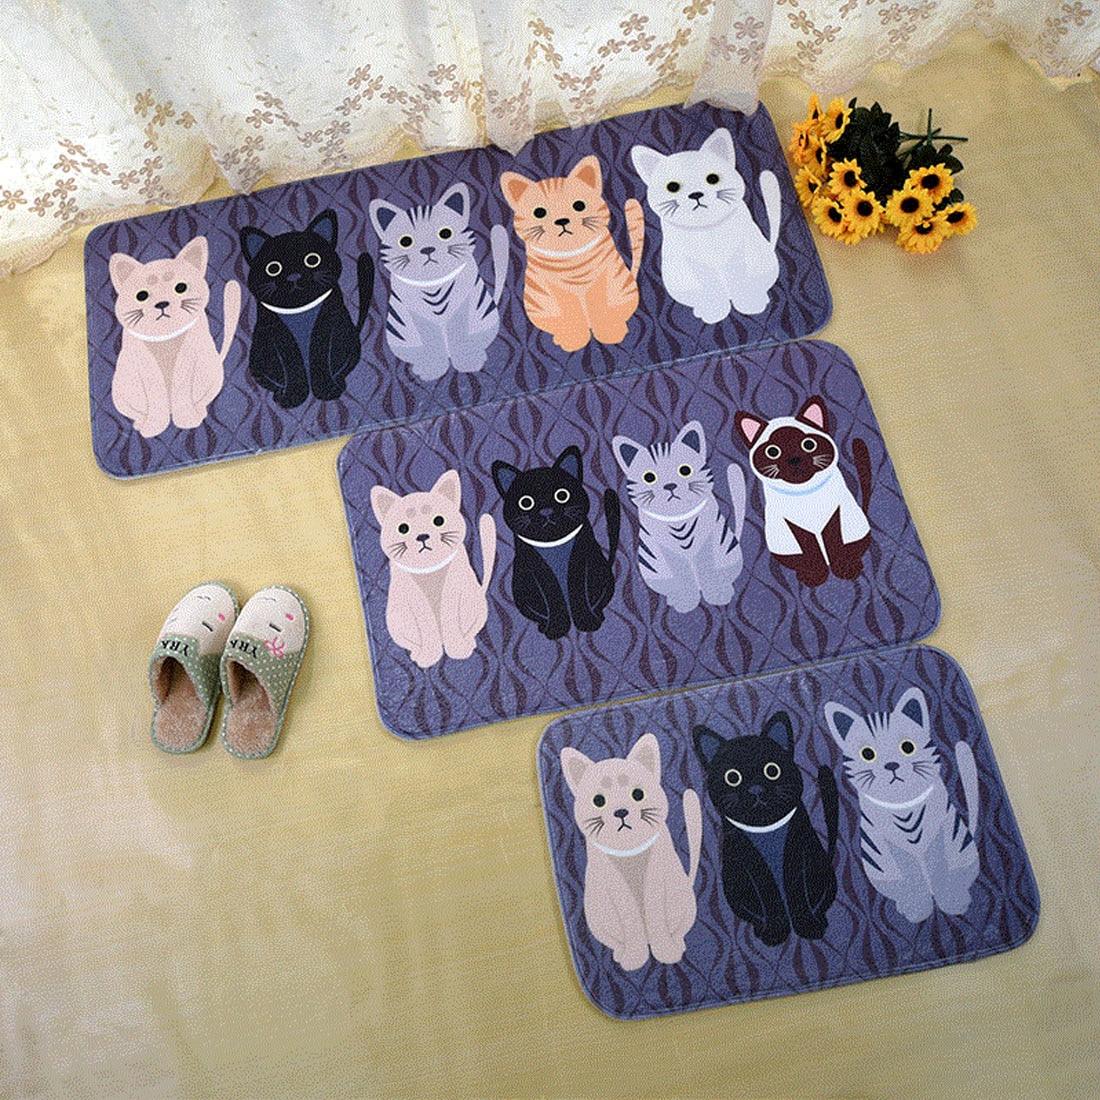 Carpets & Rugs Precise Welcome Floor Mats Animal Cat Printed Bathroom Kitchen Carpets Doormats Cat Floor Mat For Living Room Anti-slip Tapete